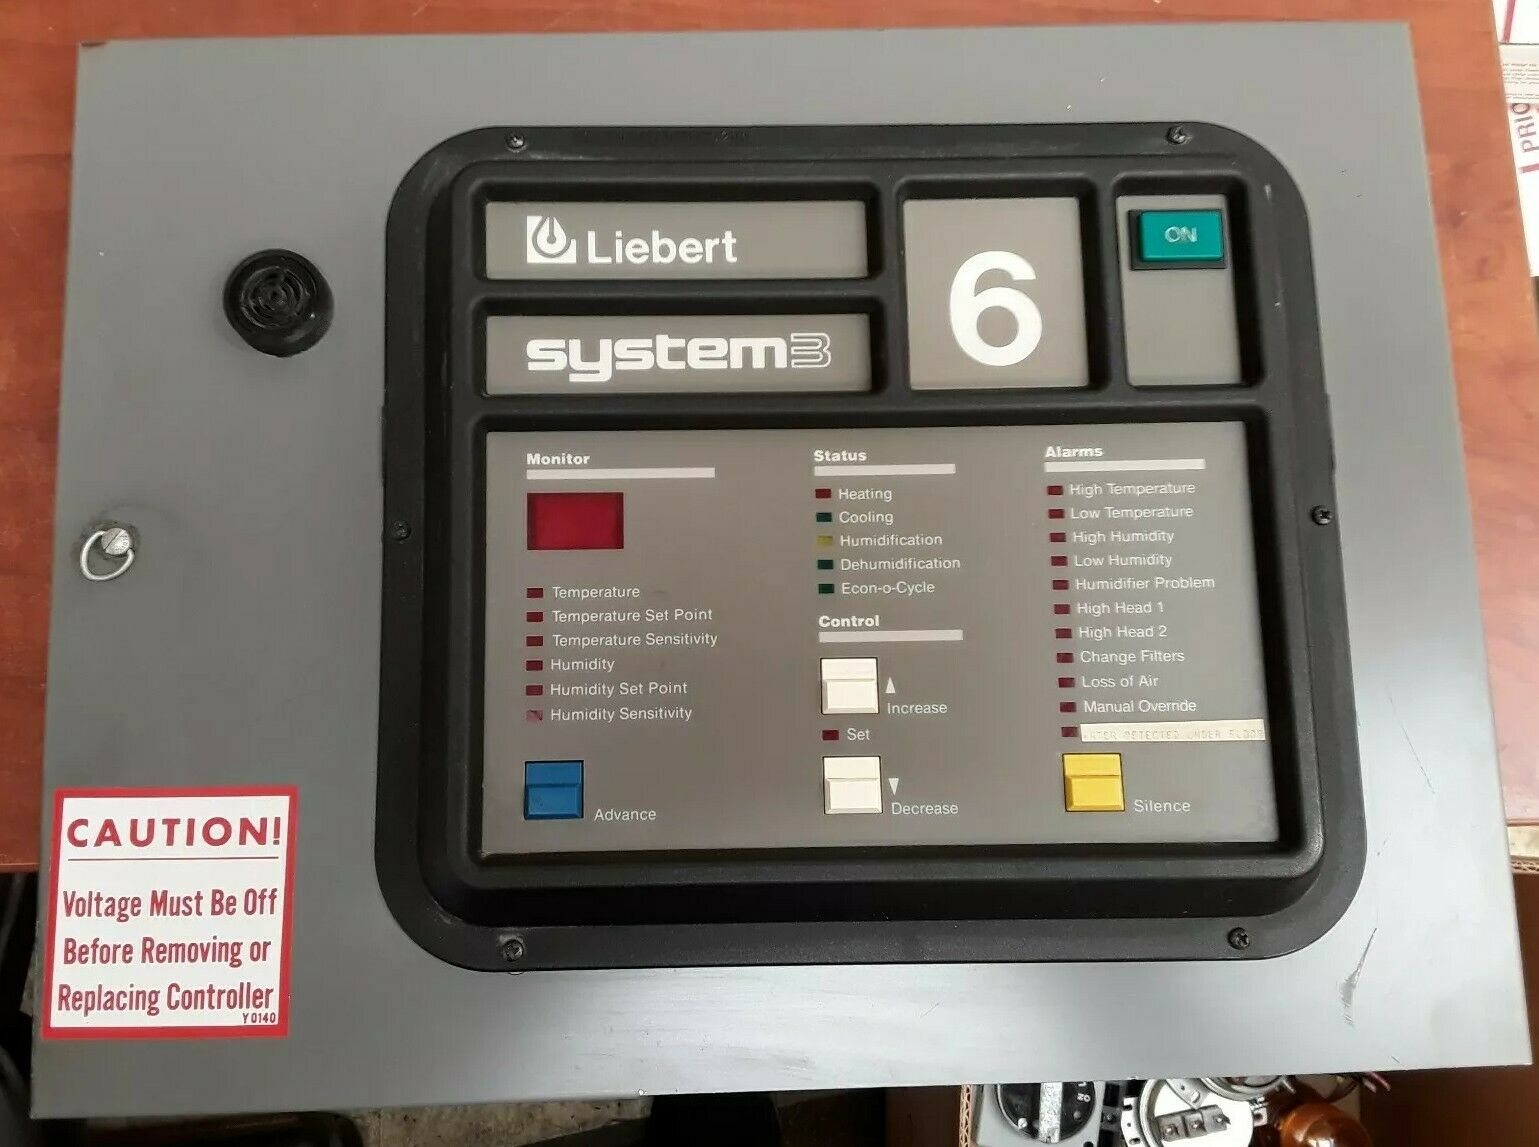 Liebert System3 S-6200 Operator Interface Display Label 6